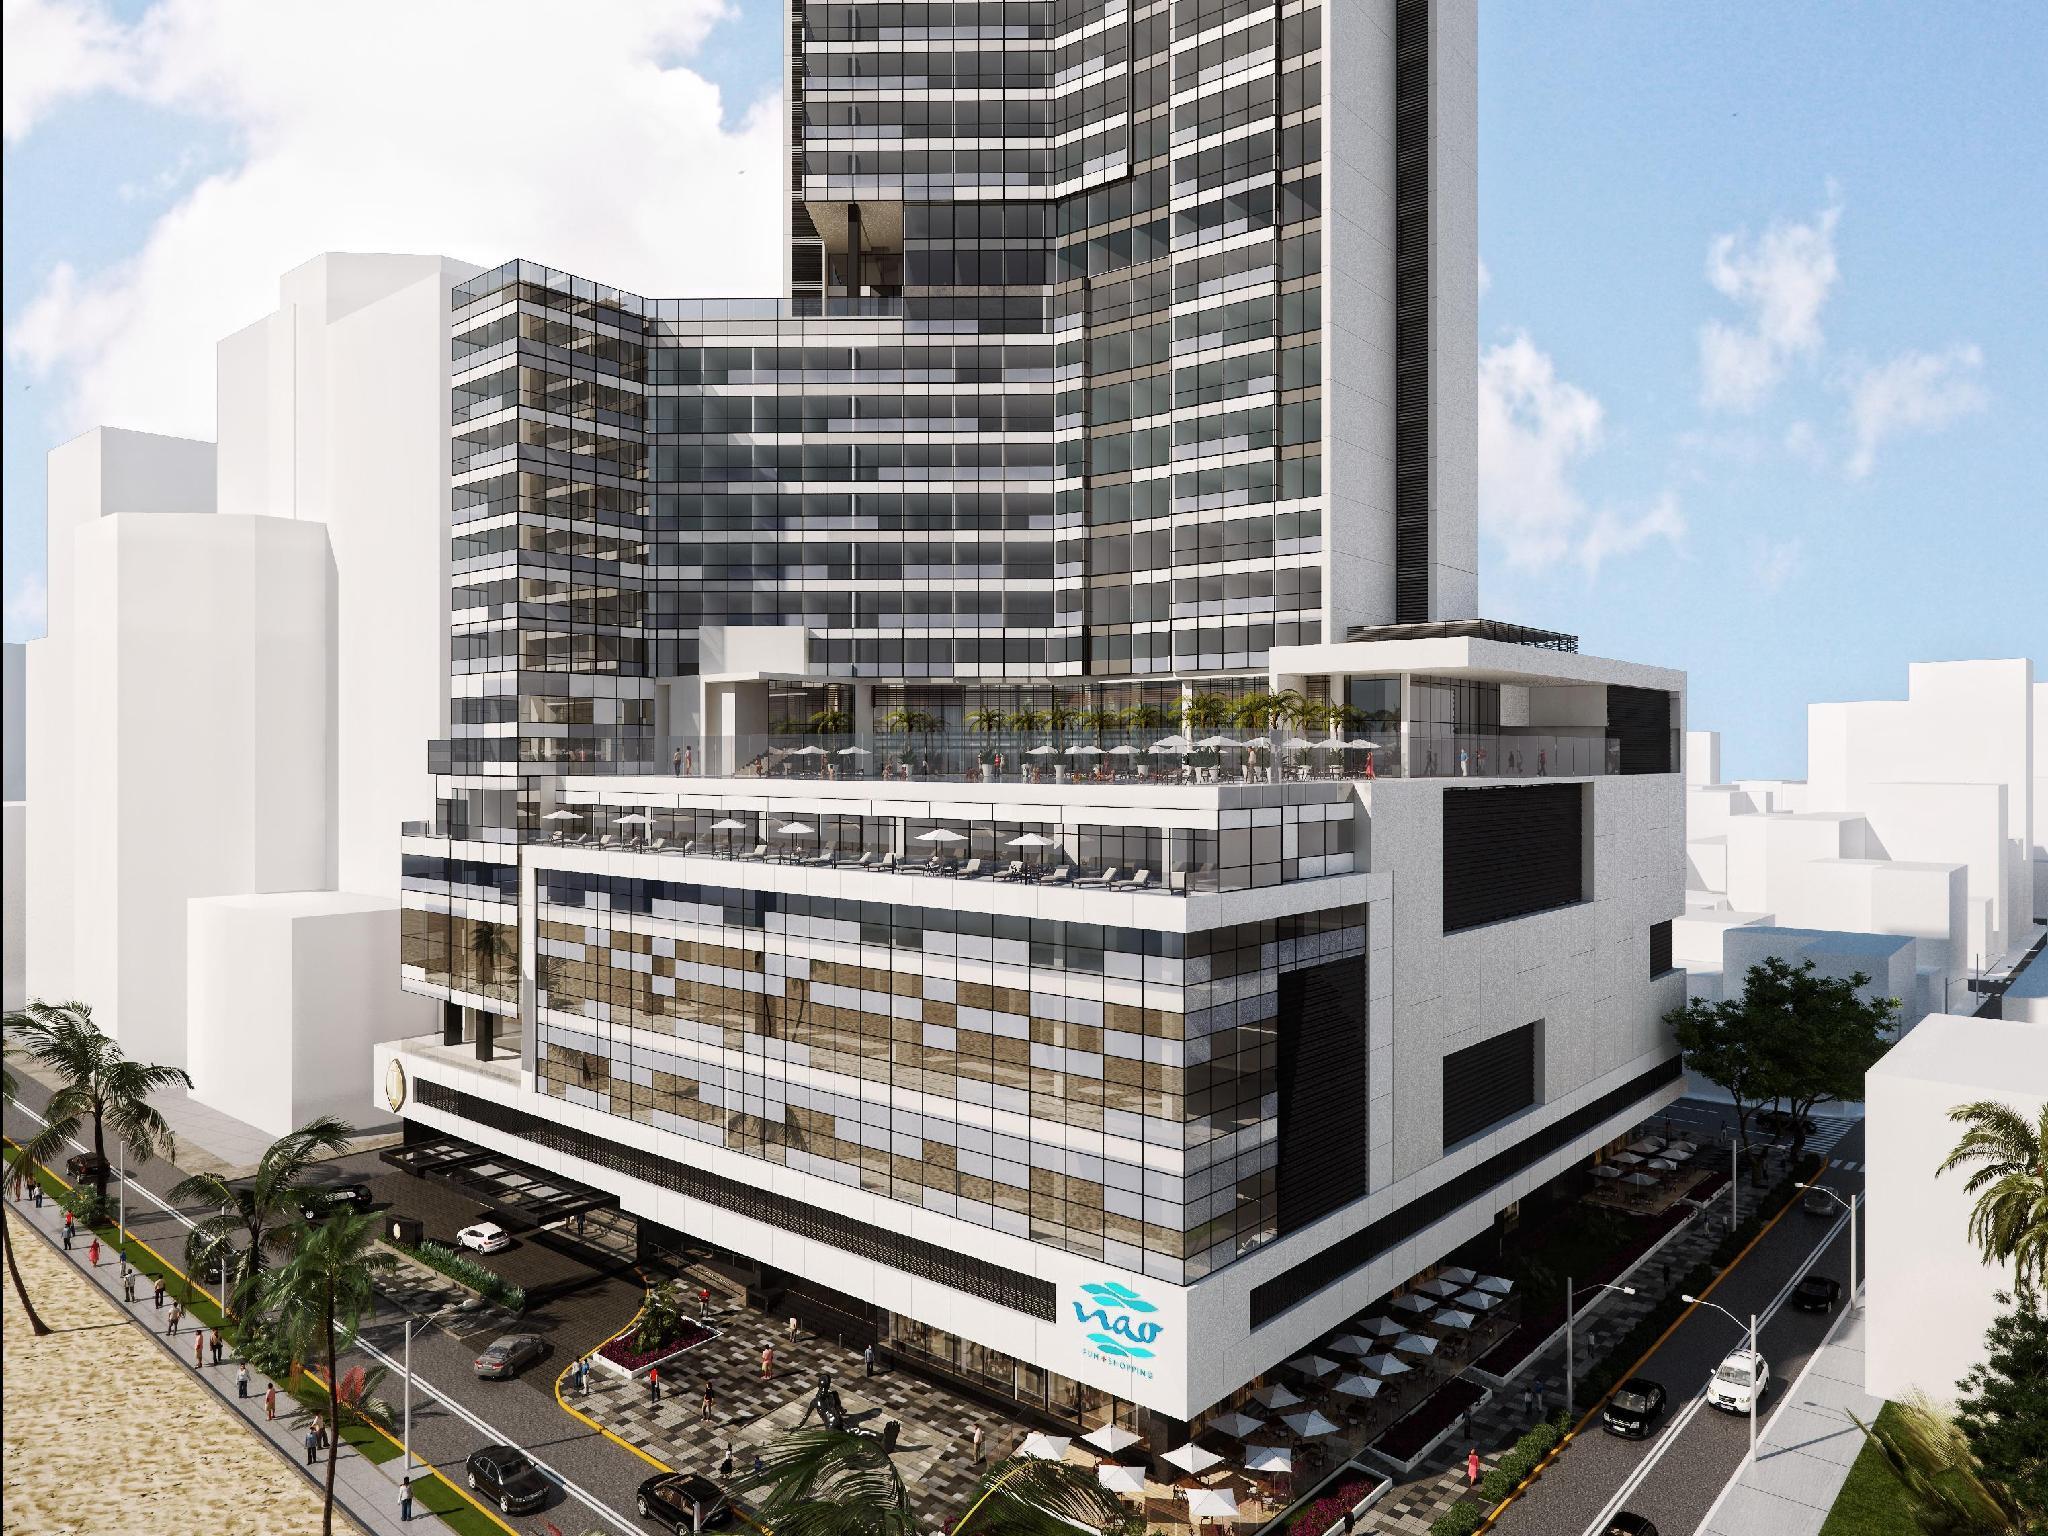 Hotel Intercontinental Cartagena Booking Agoda Com Best